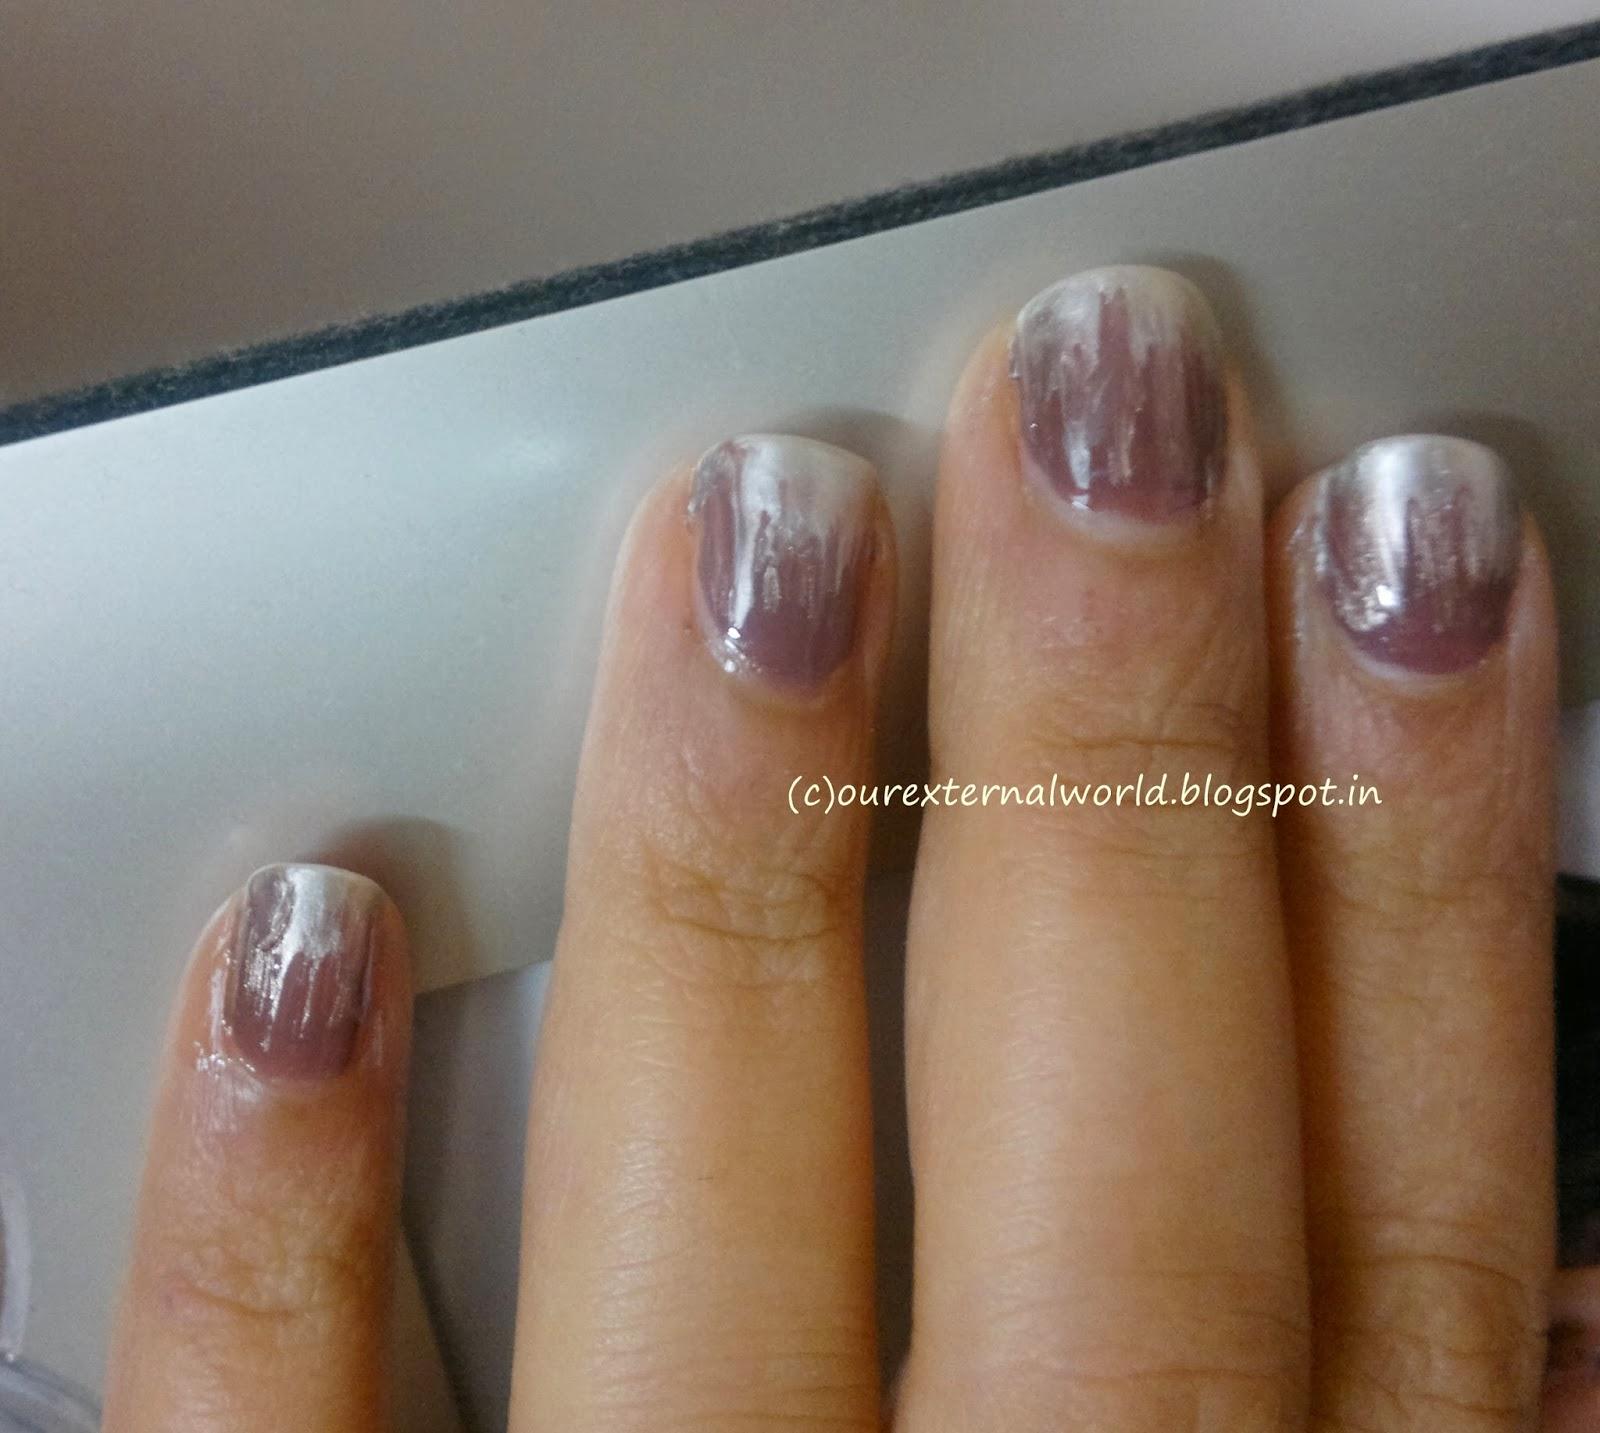 Water marble nail art easy nail art for beginners dry water marble nail art easy nail art for beginners prinsesfo Choice Image